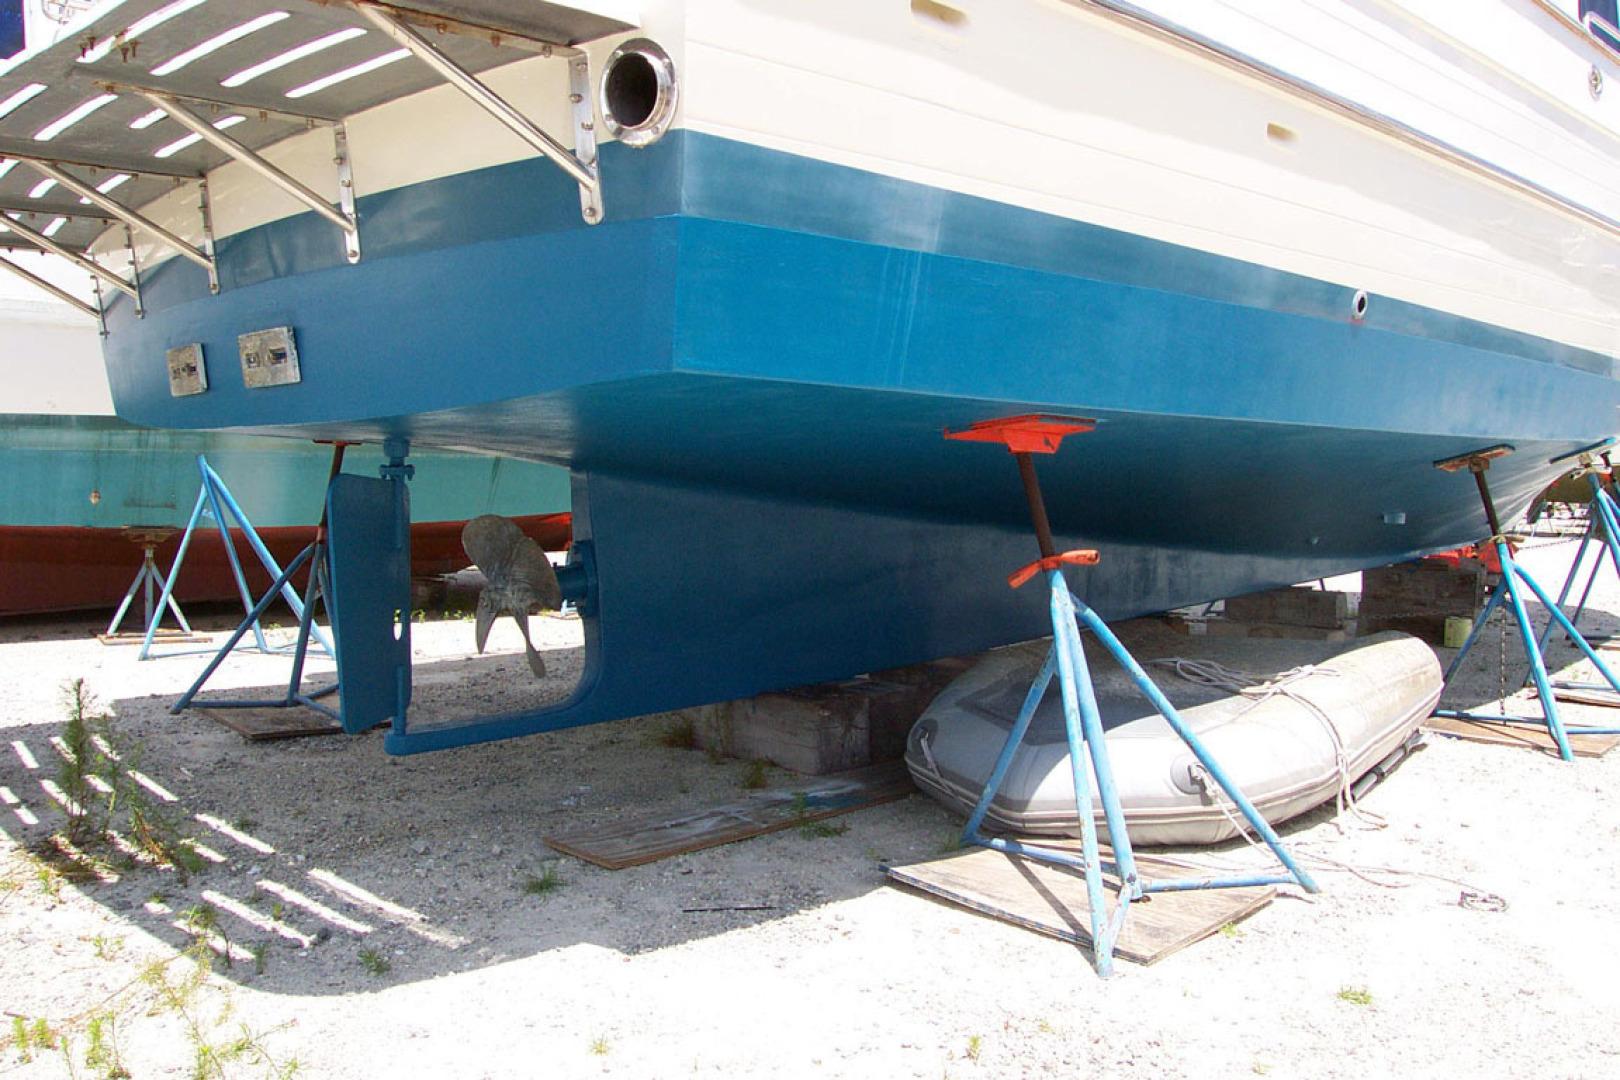 Mariner-Orient Europa 2005-ENTERPRISE Stuart-Florida-United States-Keel and Sand Shoe-1567643   Thumbnail